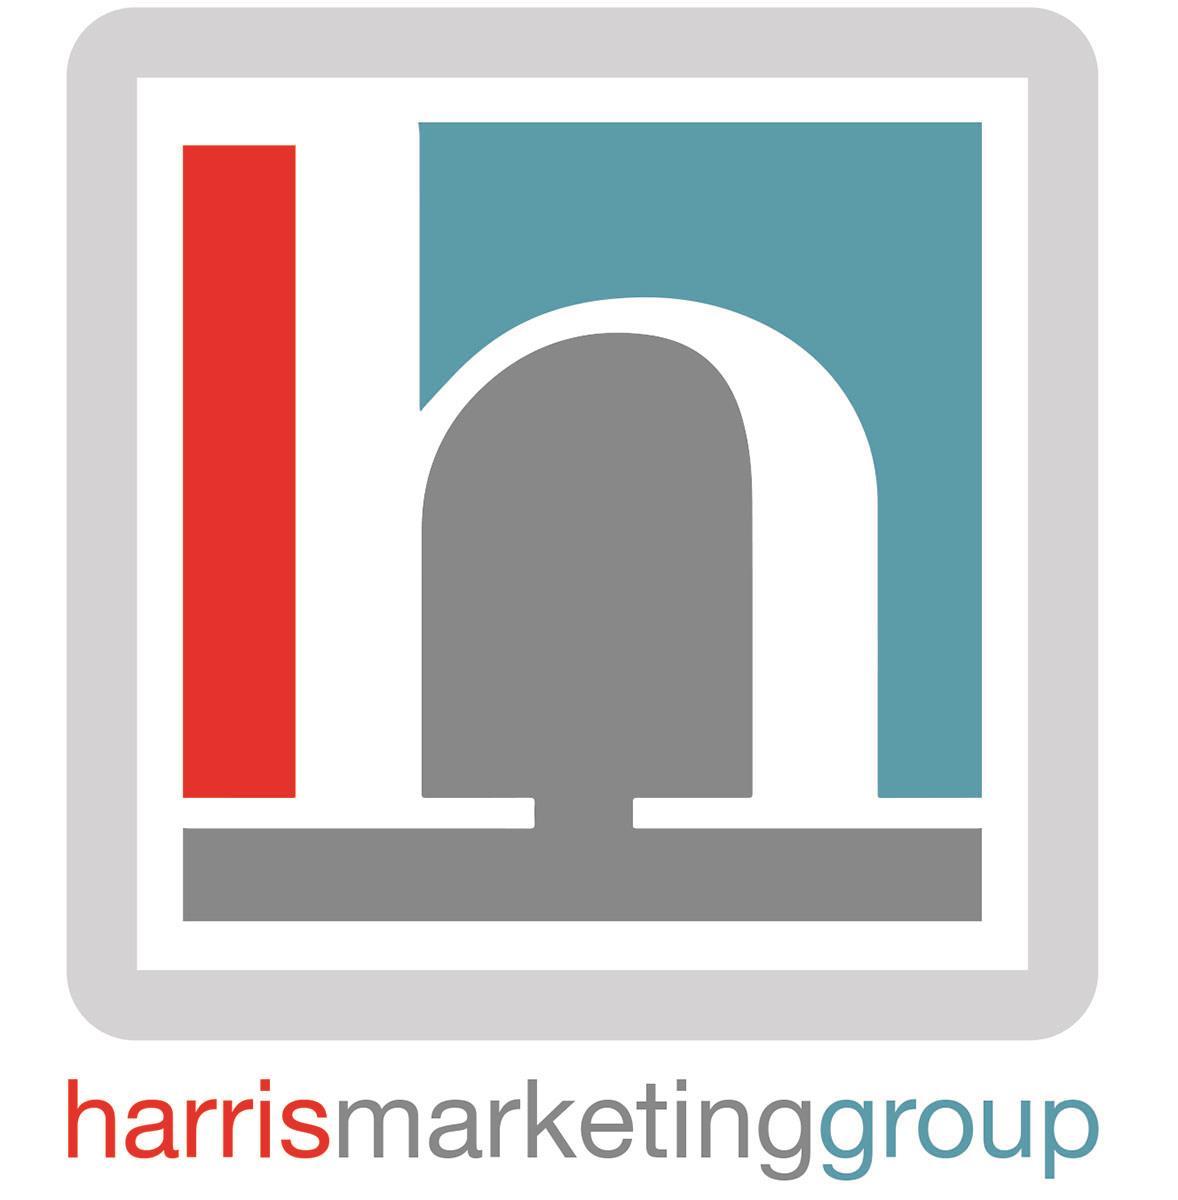 Harris Marketing Group